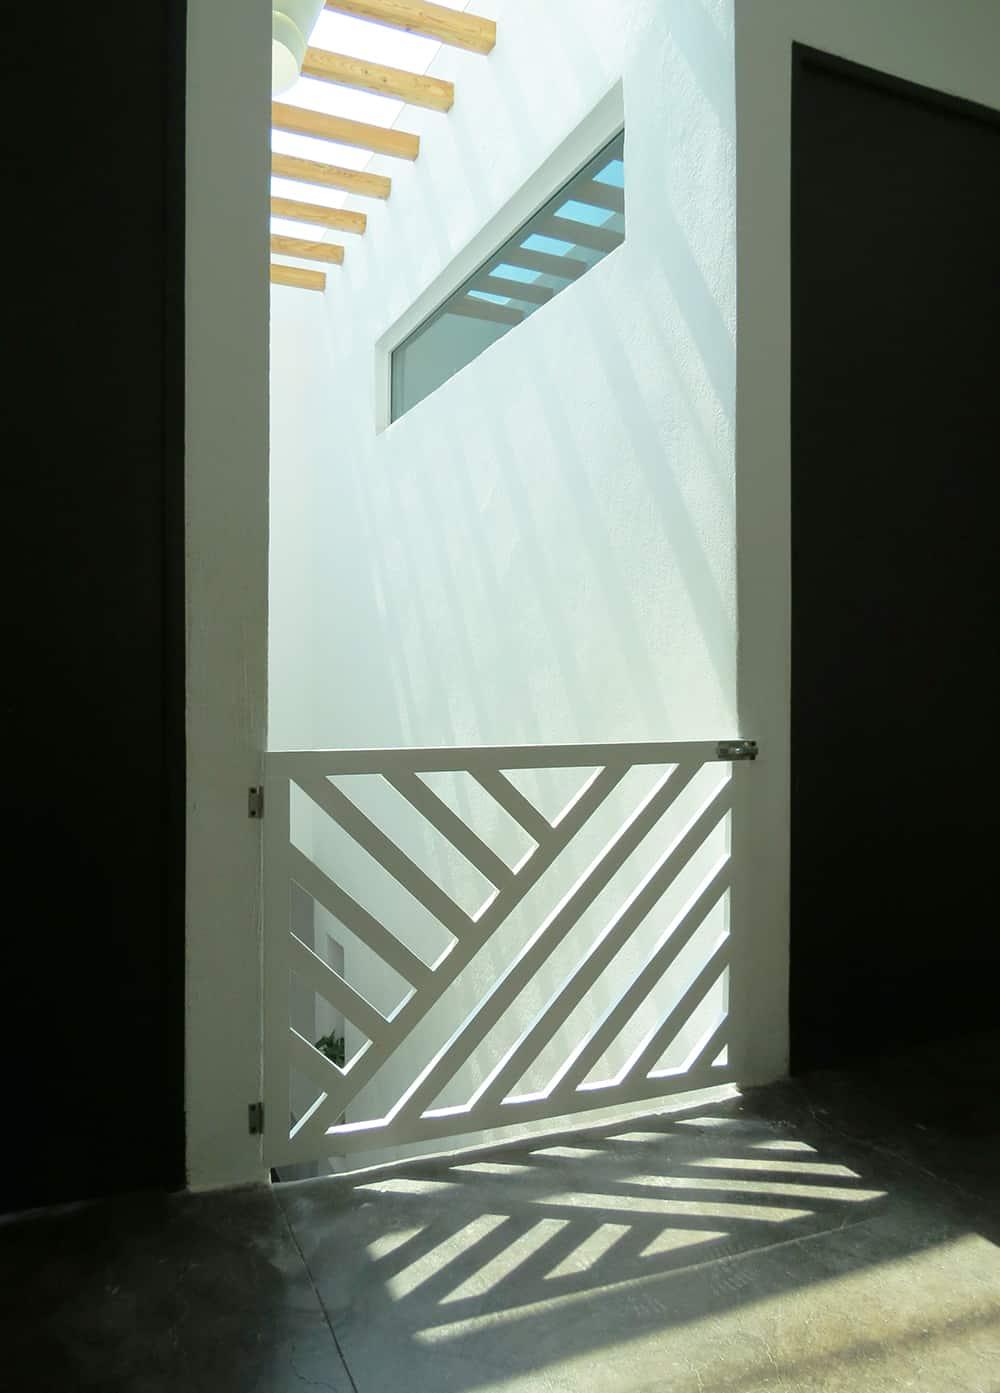 DIY modern baby gate